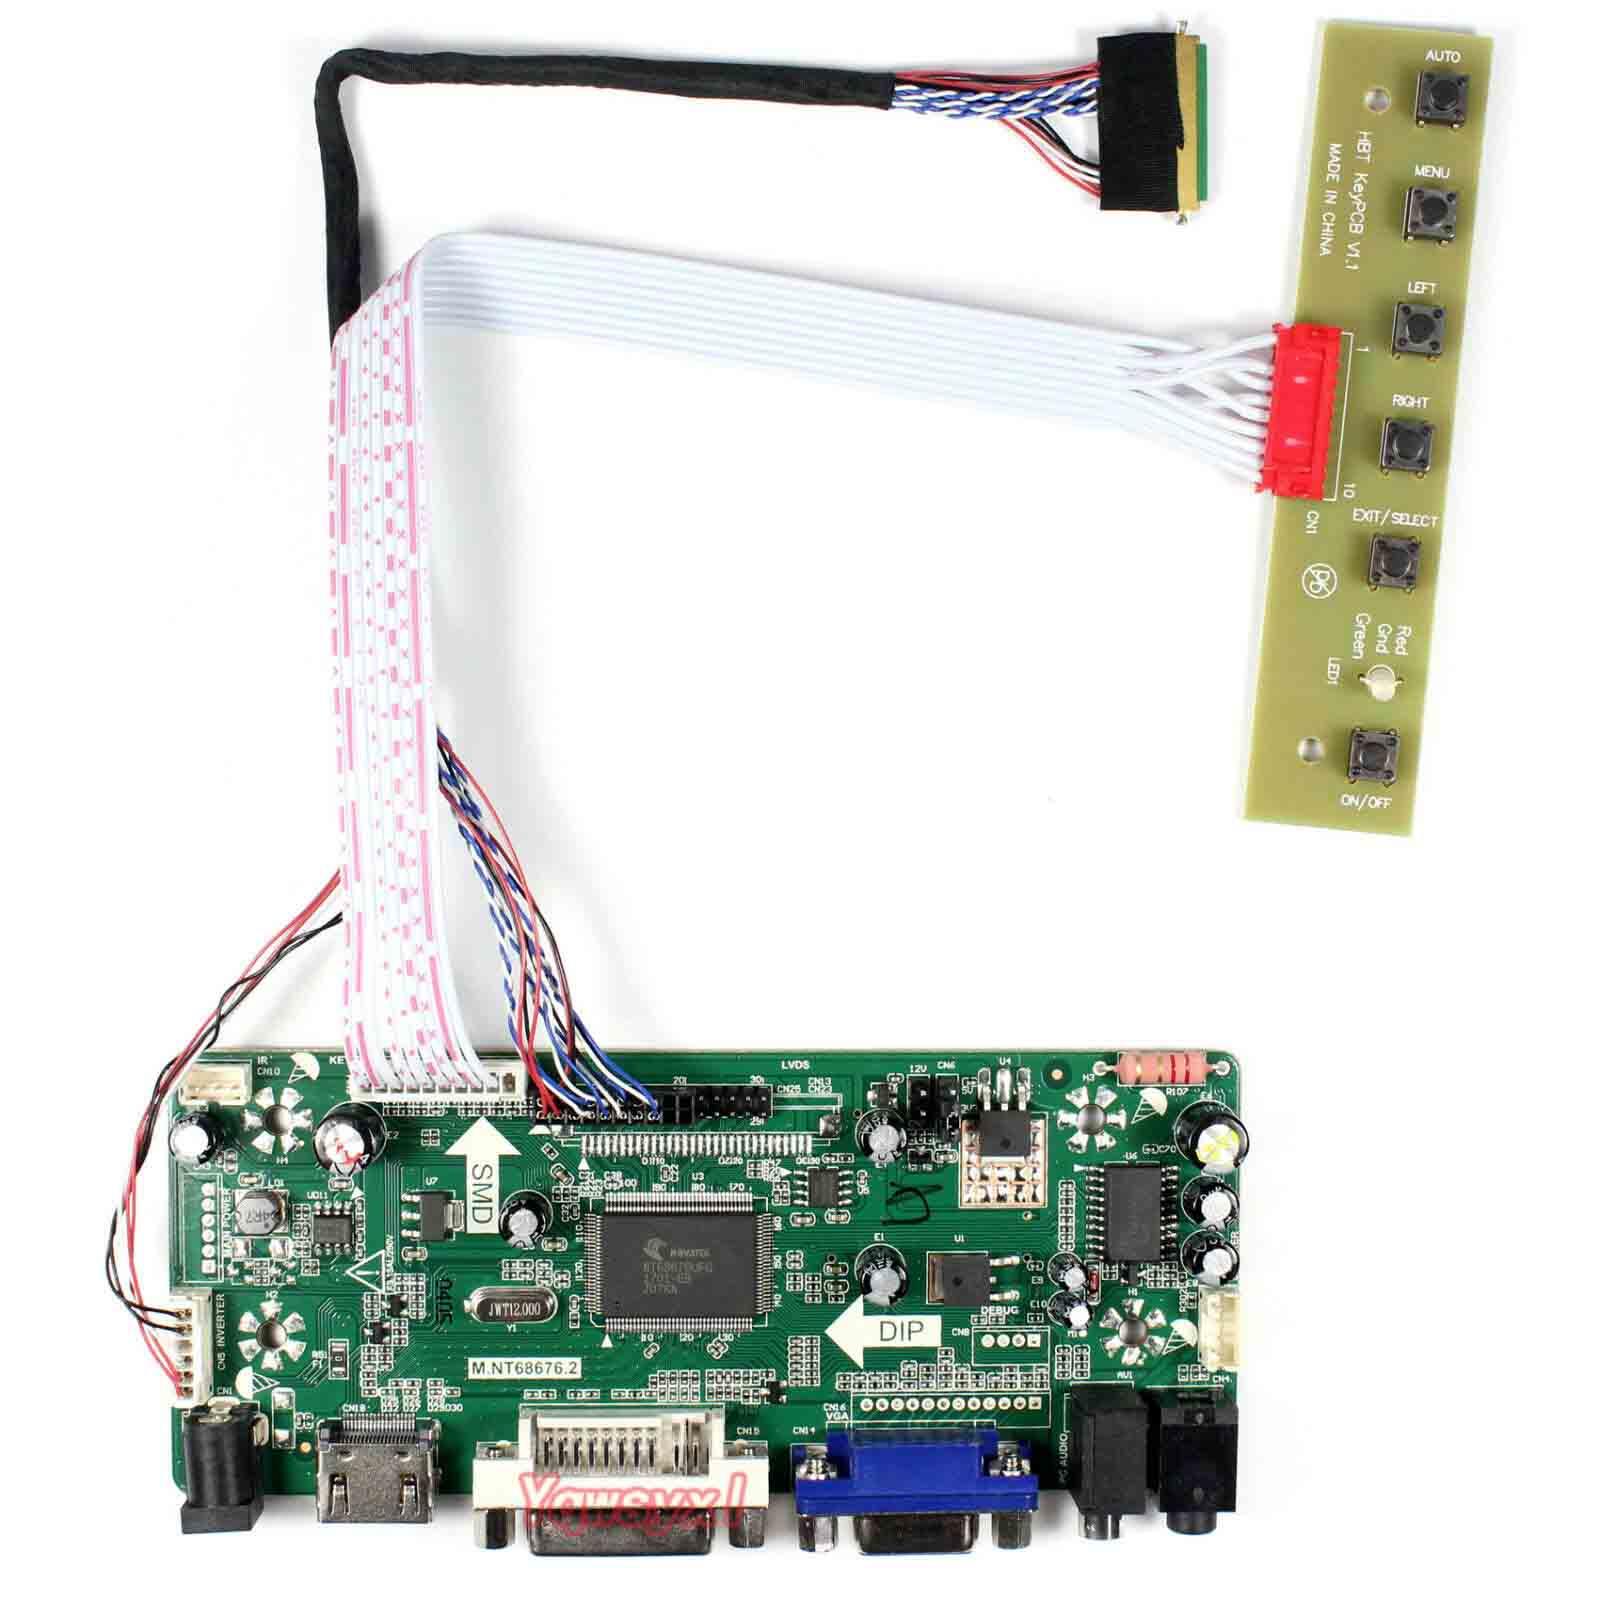 Yqwsyxl Control Board Monitor Kit For N156B6-L04 N156B6-L06 HDMI+DVI +VGA LCD LED  Screen Controller Board Driver